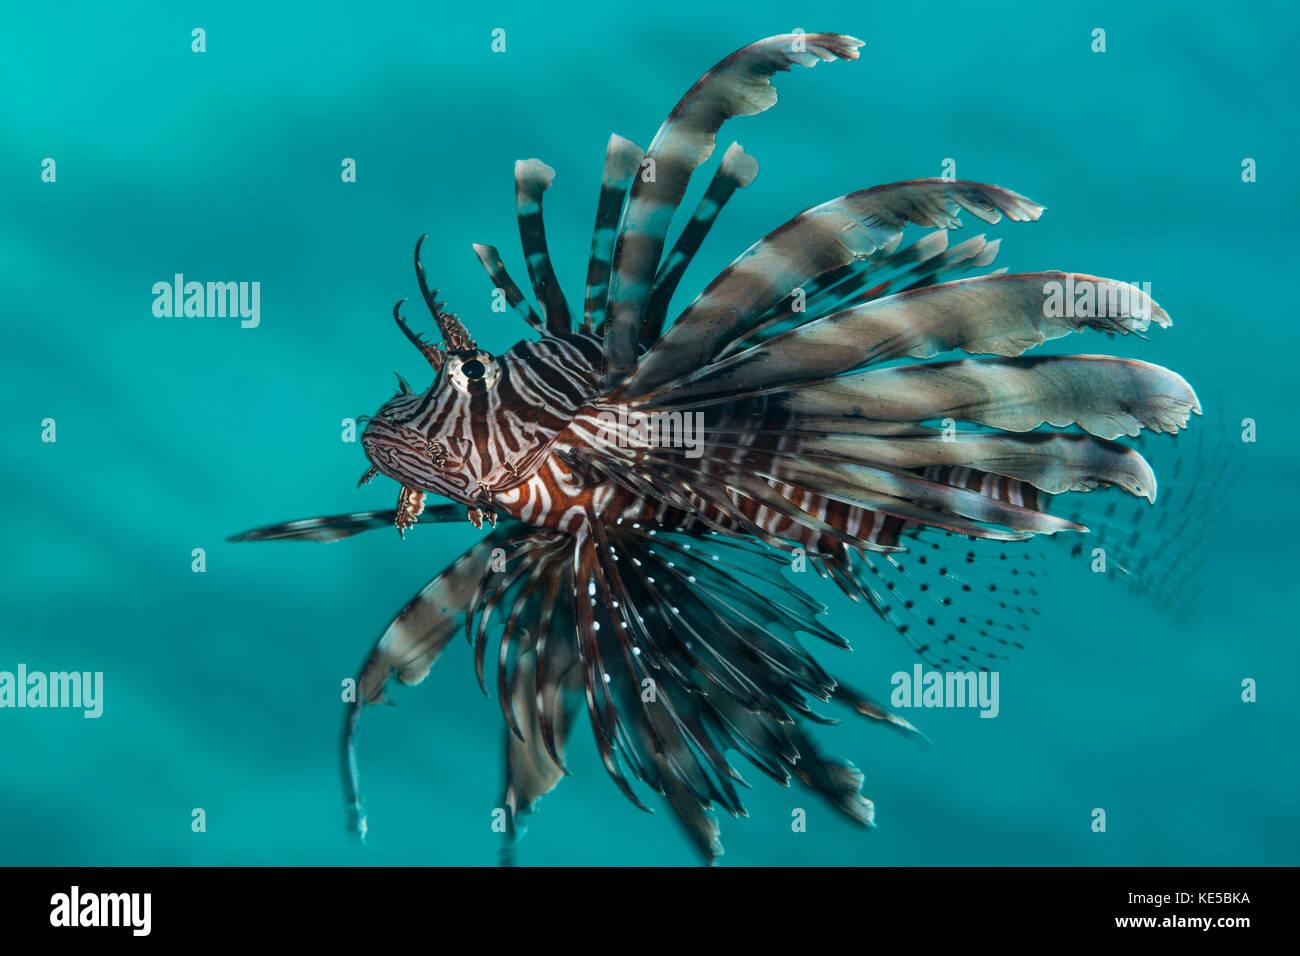 Common Lionfish, Pterois miles, Elphinstone Reef, Red Sea, Egypt - Stock Image